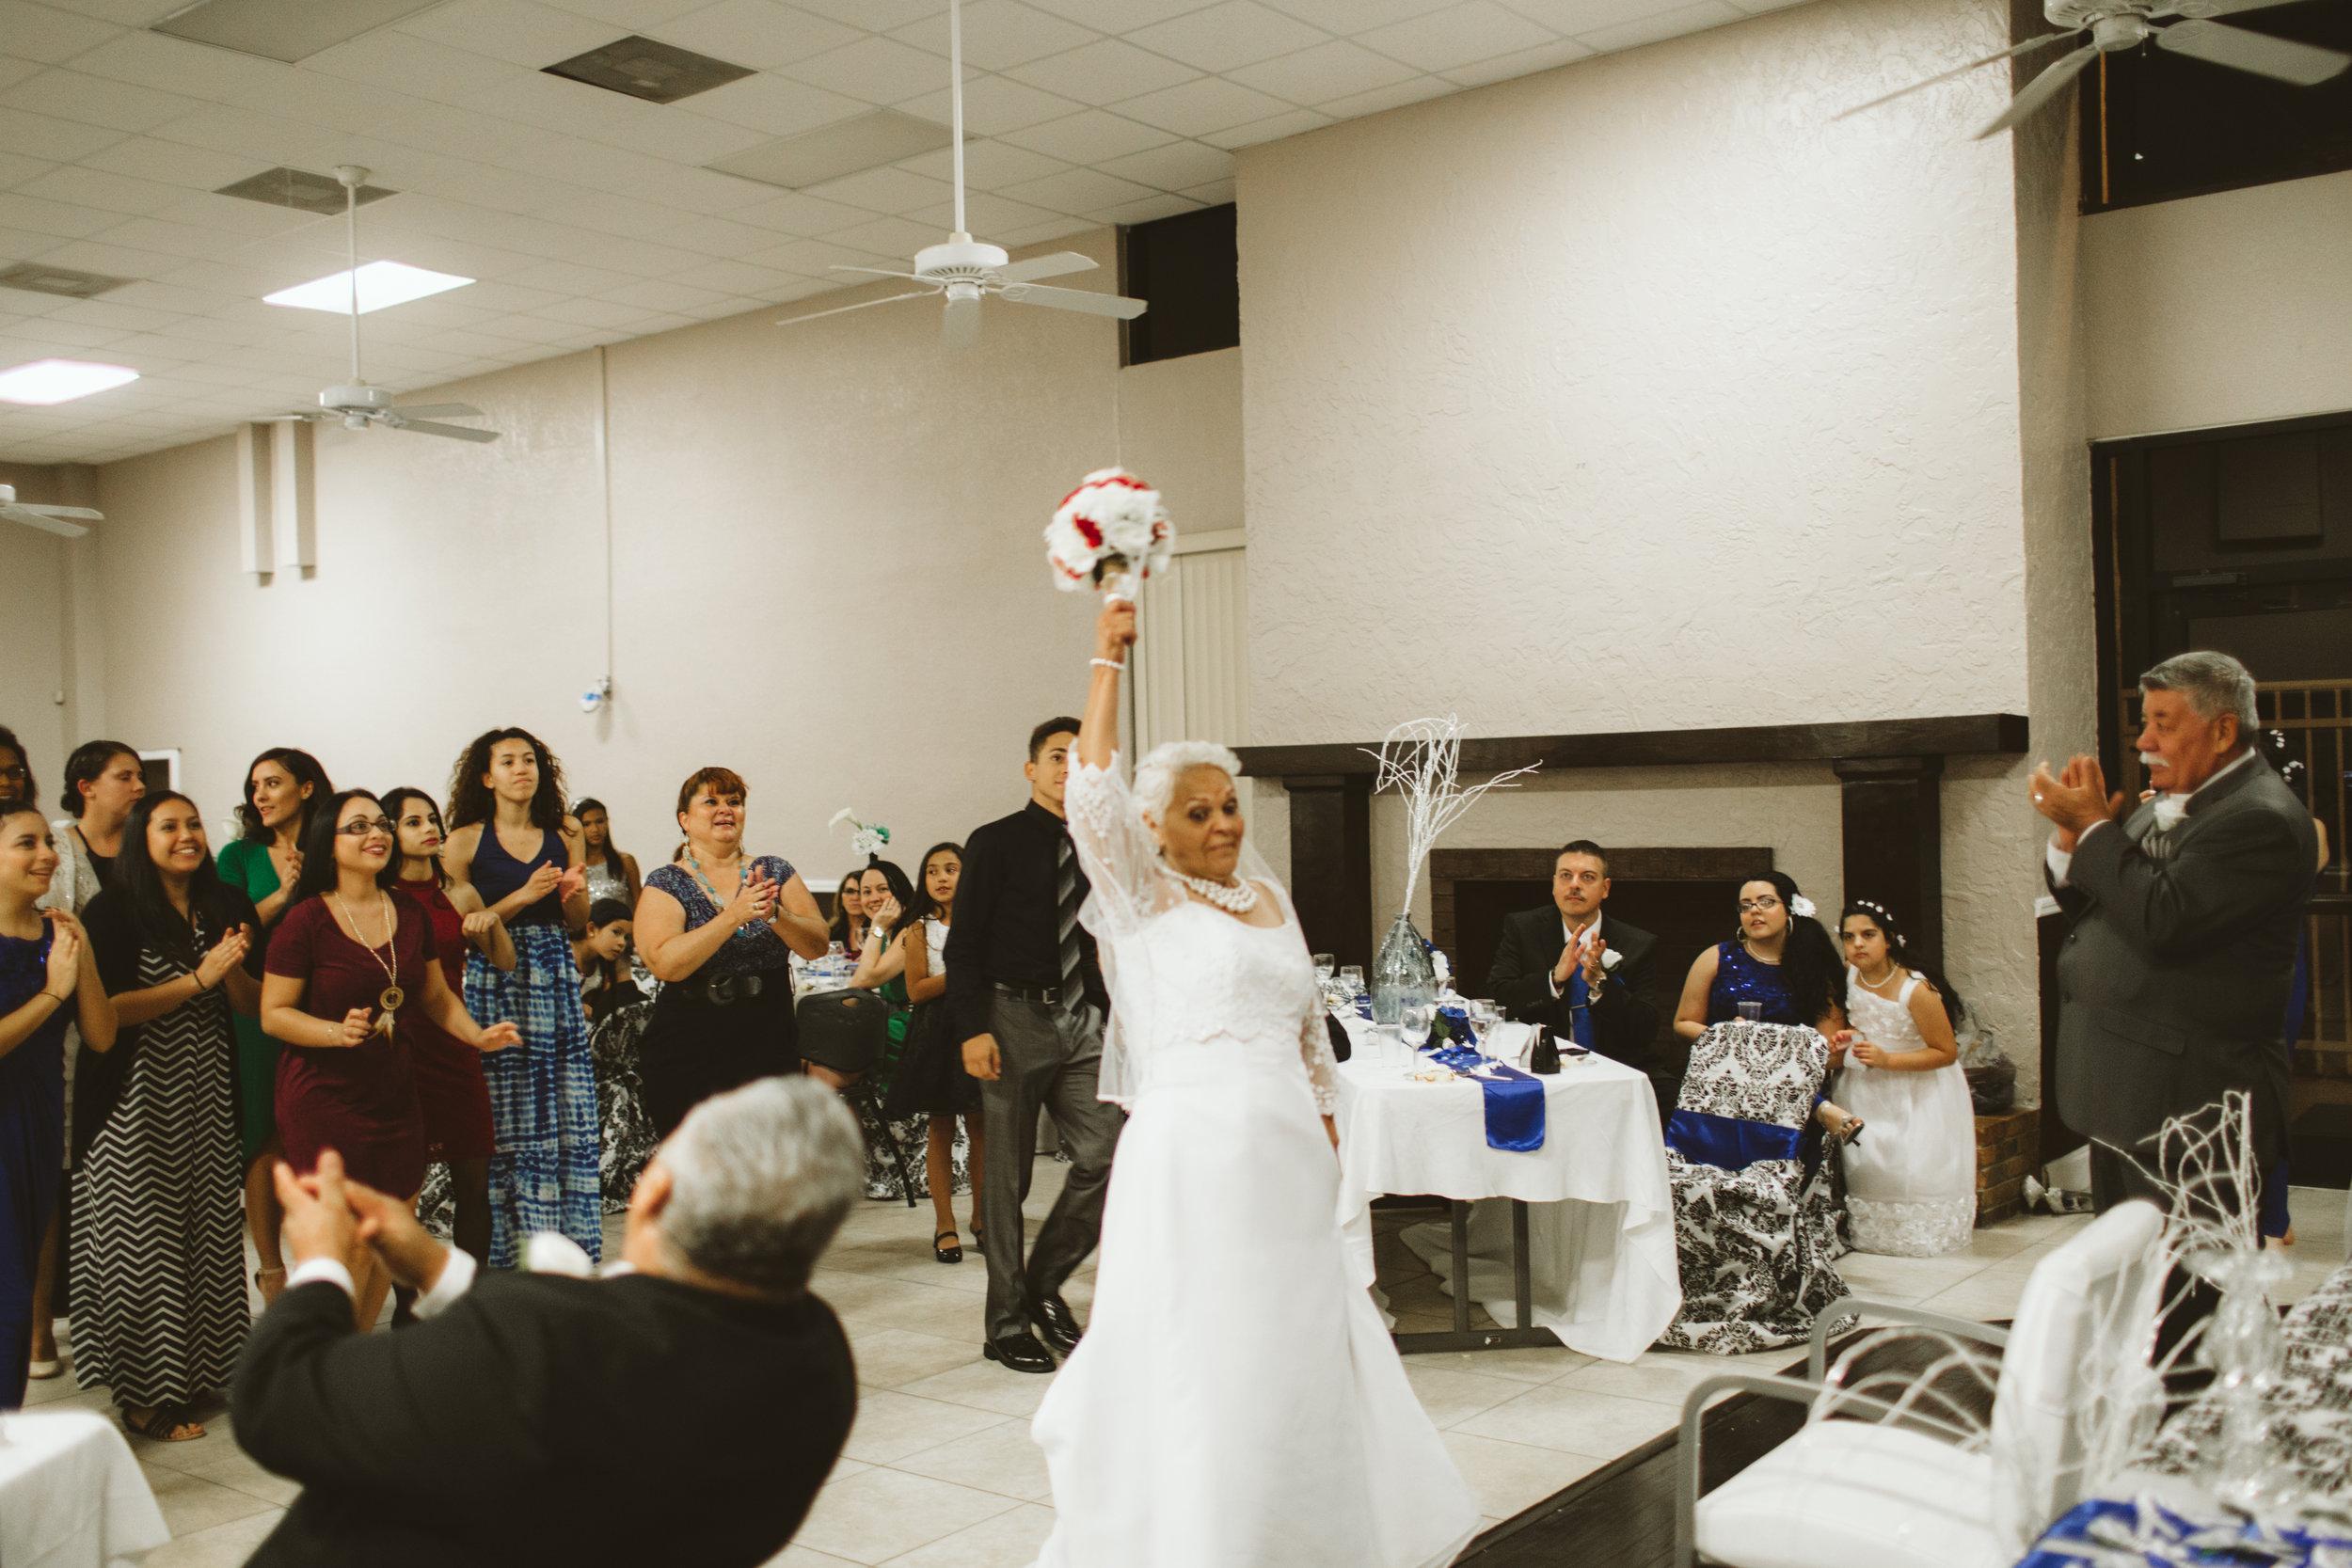 wedding | Vanessa Boy Photography | vanessaboy.com |-386.jpg